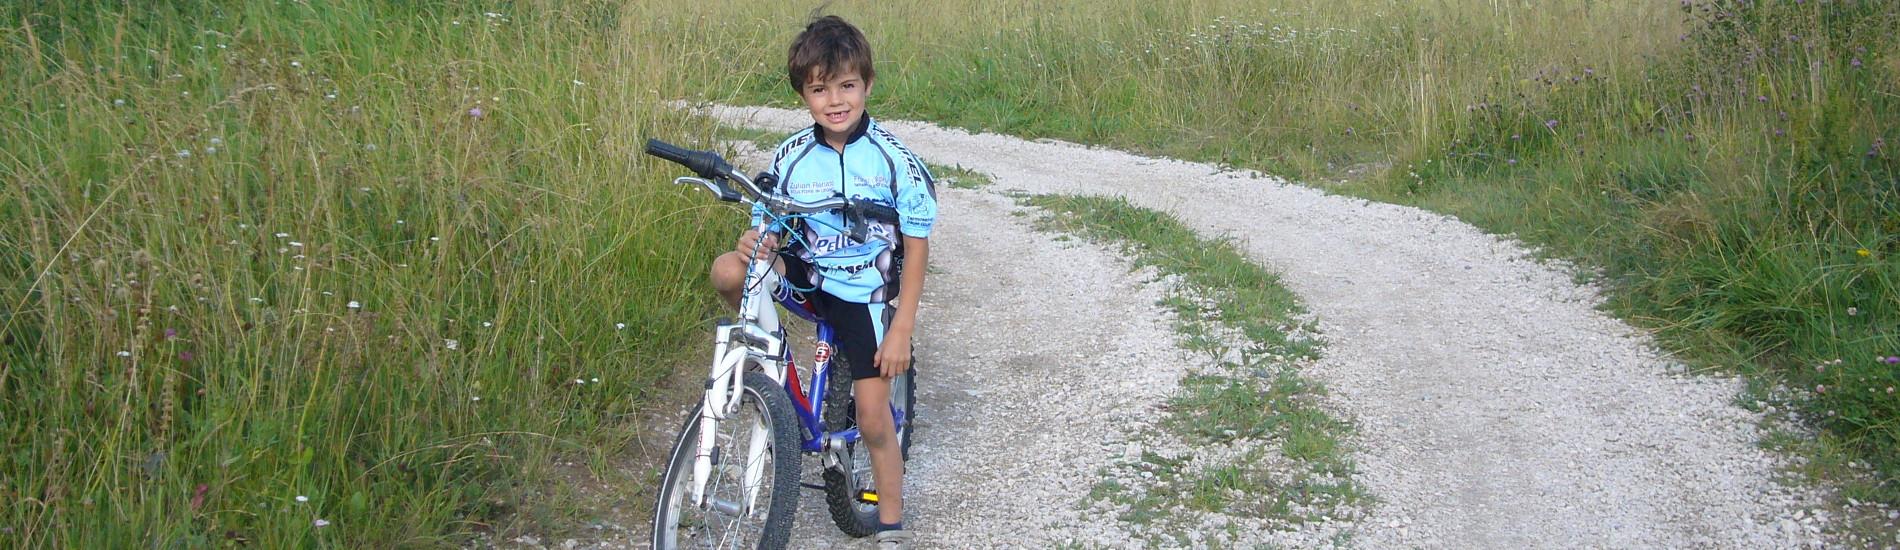 Percorsi in Mountain Bike per Bambini in Val di Fassa